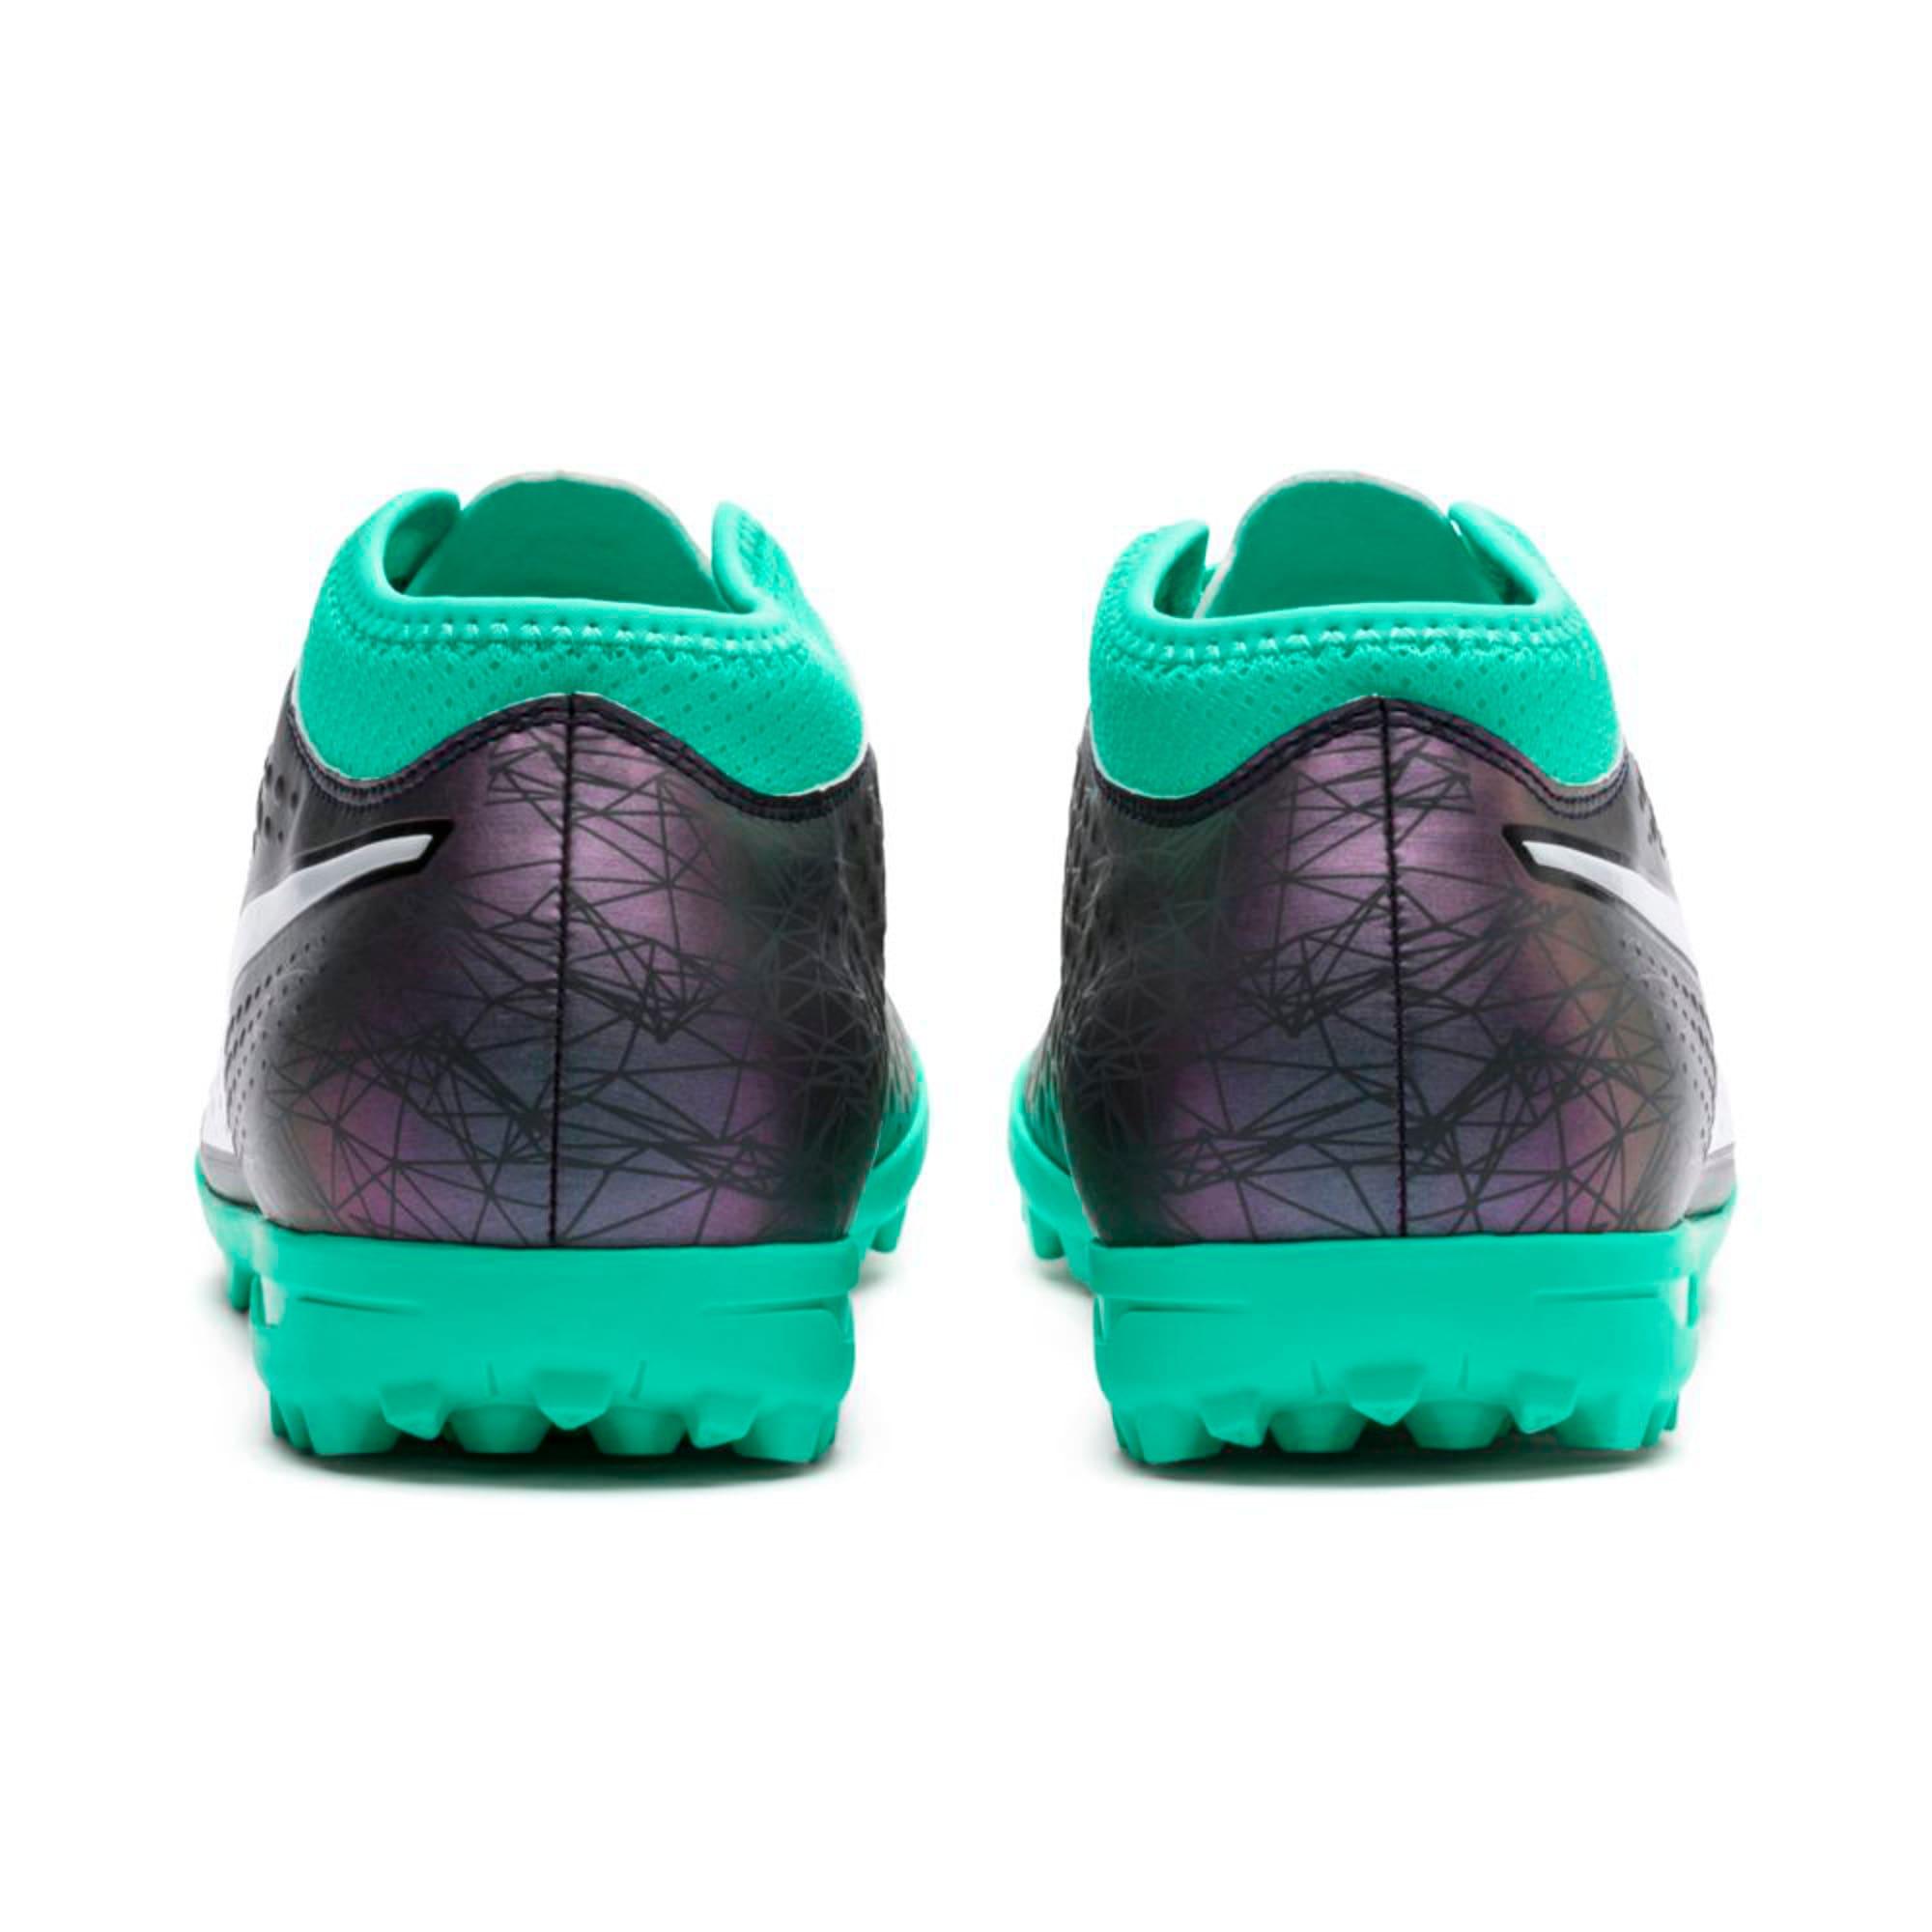 Thumbnail 4 of ONE 4 ILLUMINATE Synthetic TT  Football Boots, Col Shift-Green-White-Black, medium-IND